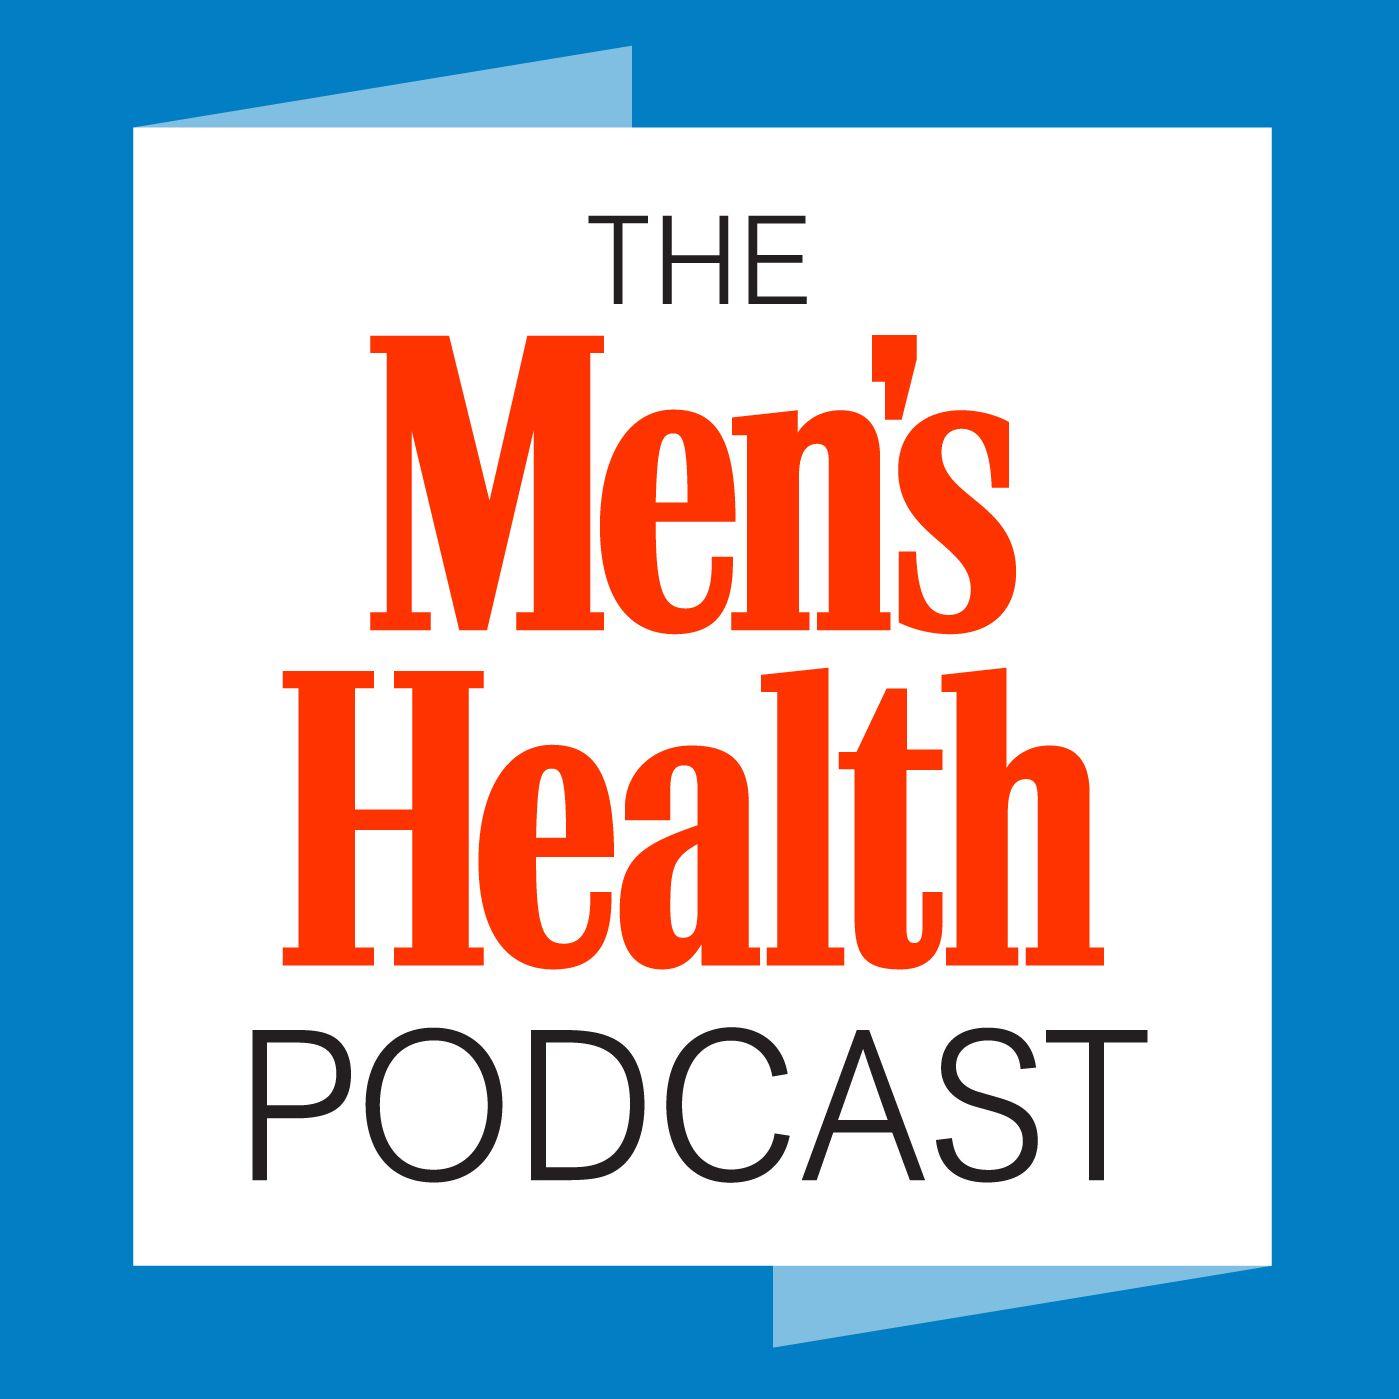 Best Men's Fitness After 50 Podcast Episodes | Most